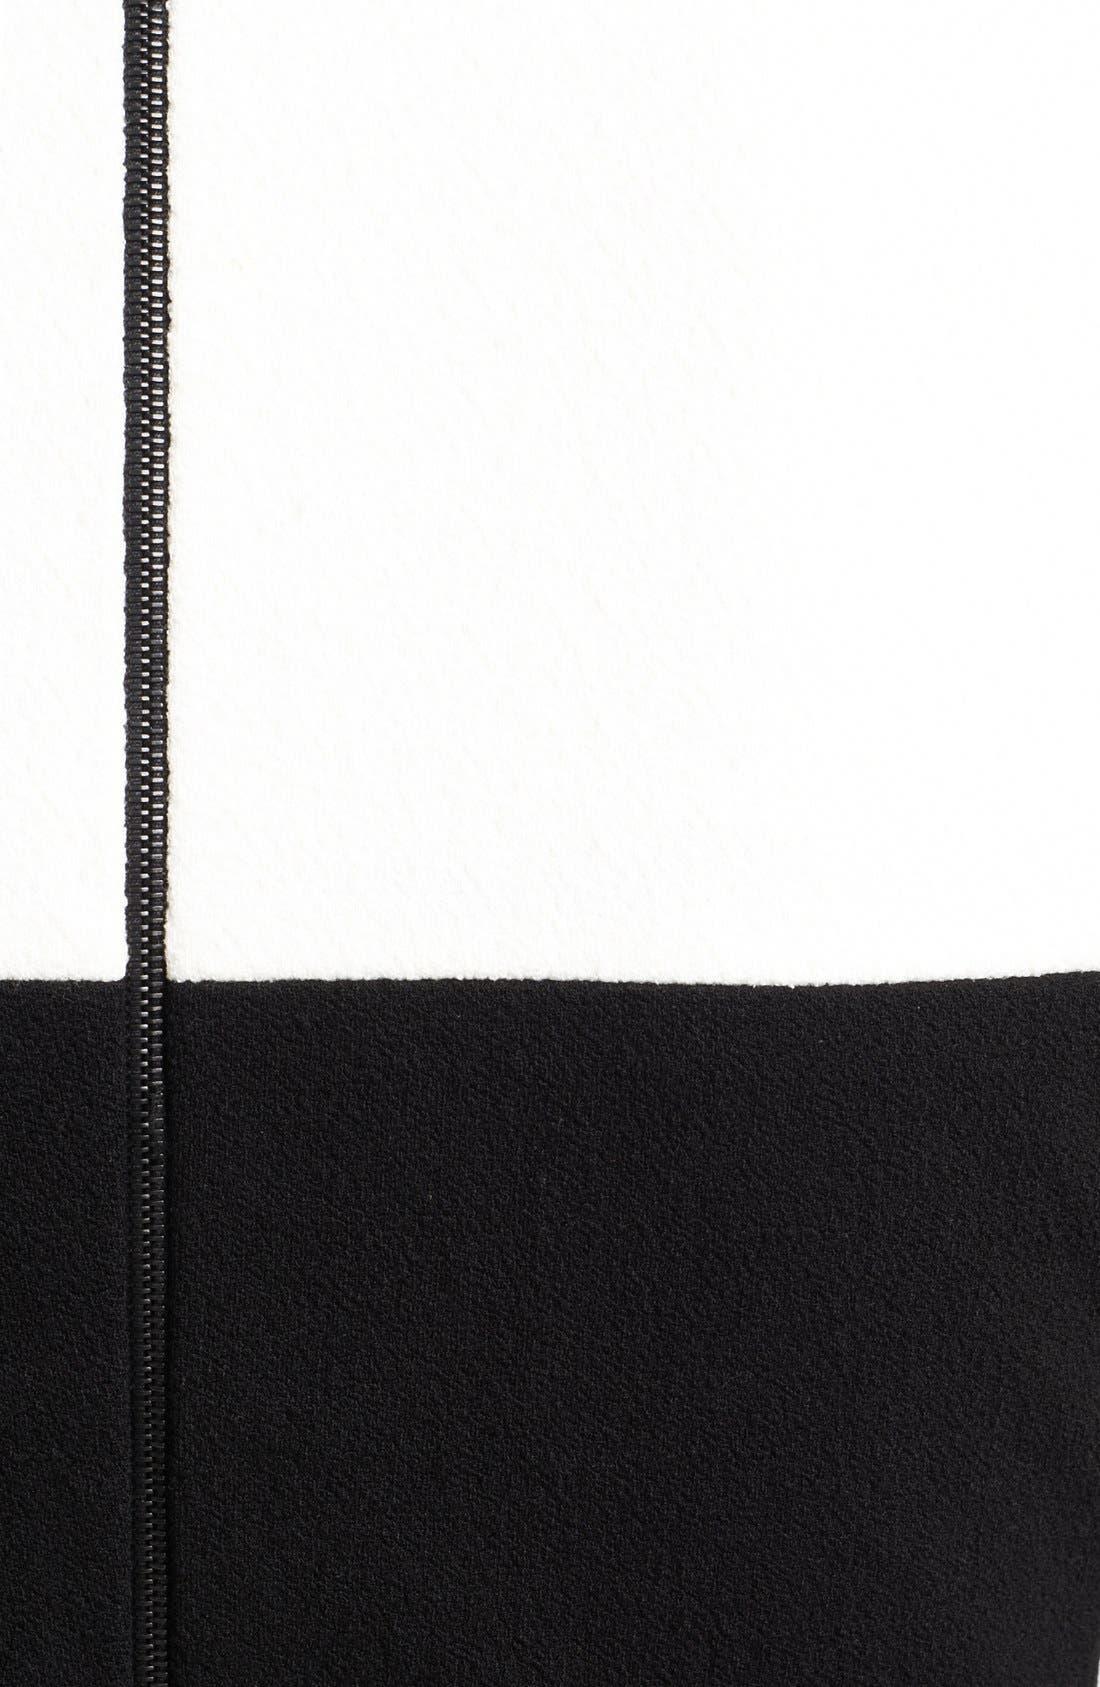 Colorblock Stretch Pebble Crepe Dress,                             Alternate thumbnail 3, color,                             400